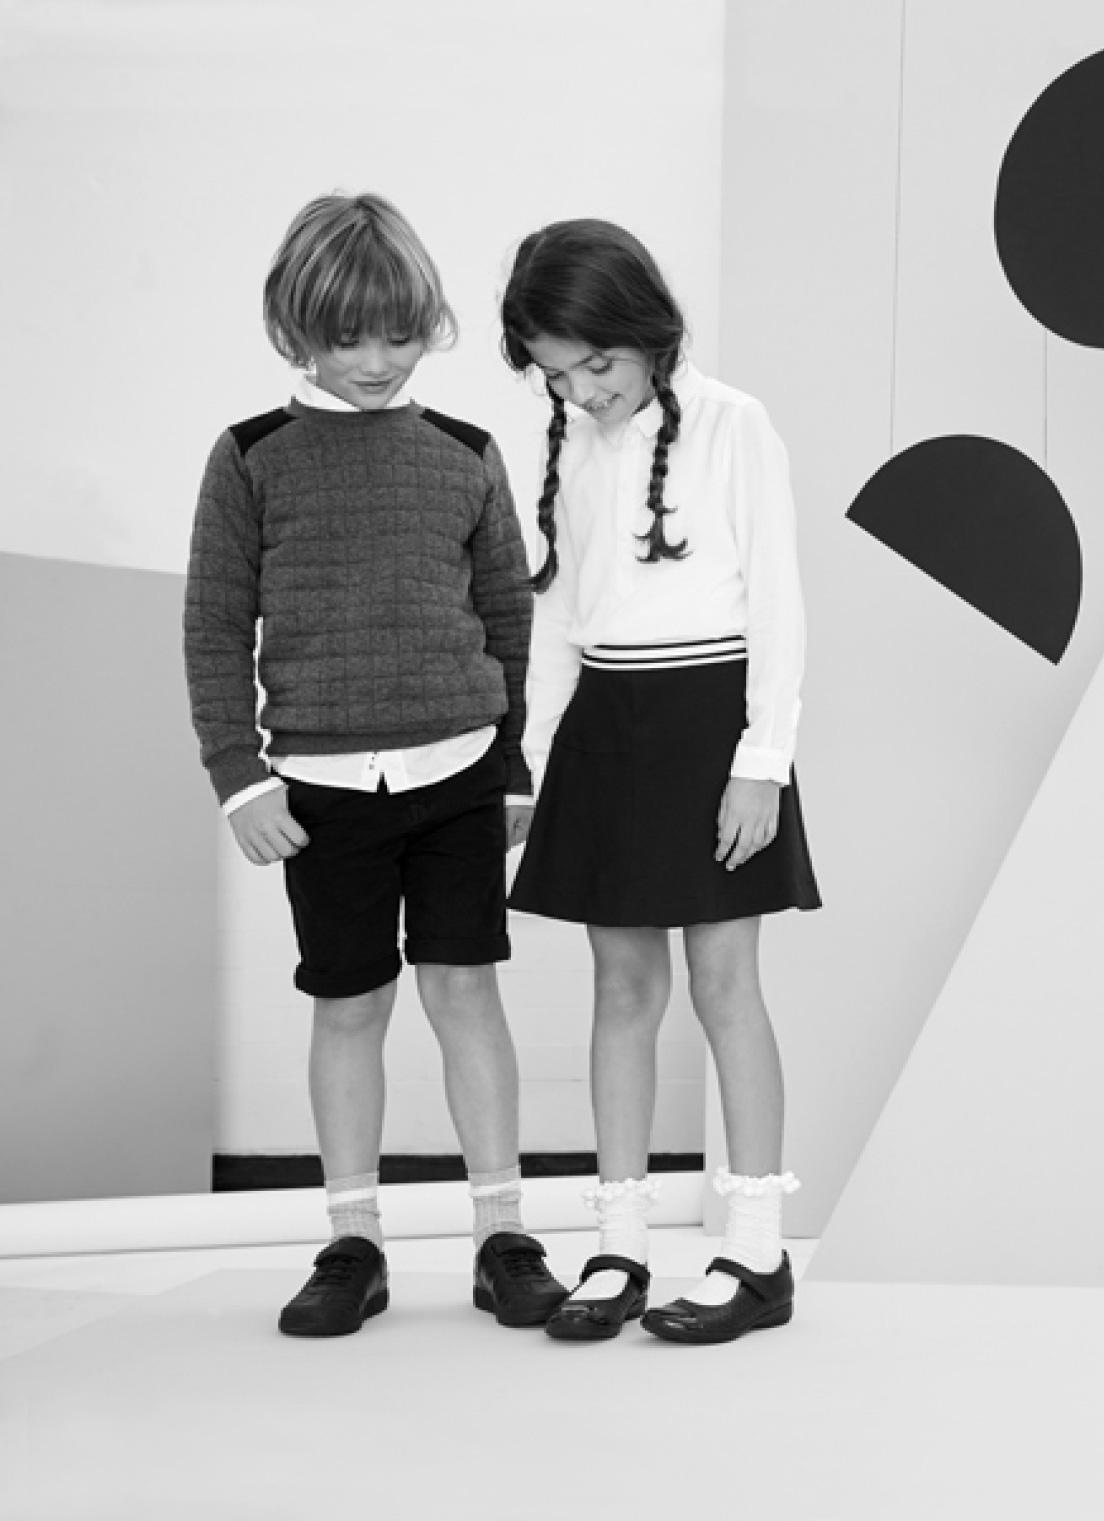 bc-brands-hero-images-shoewarehouse.jpg